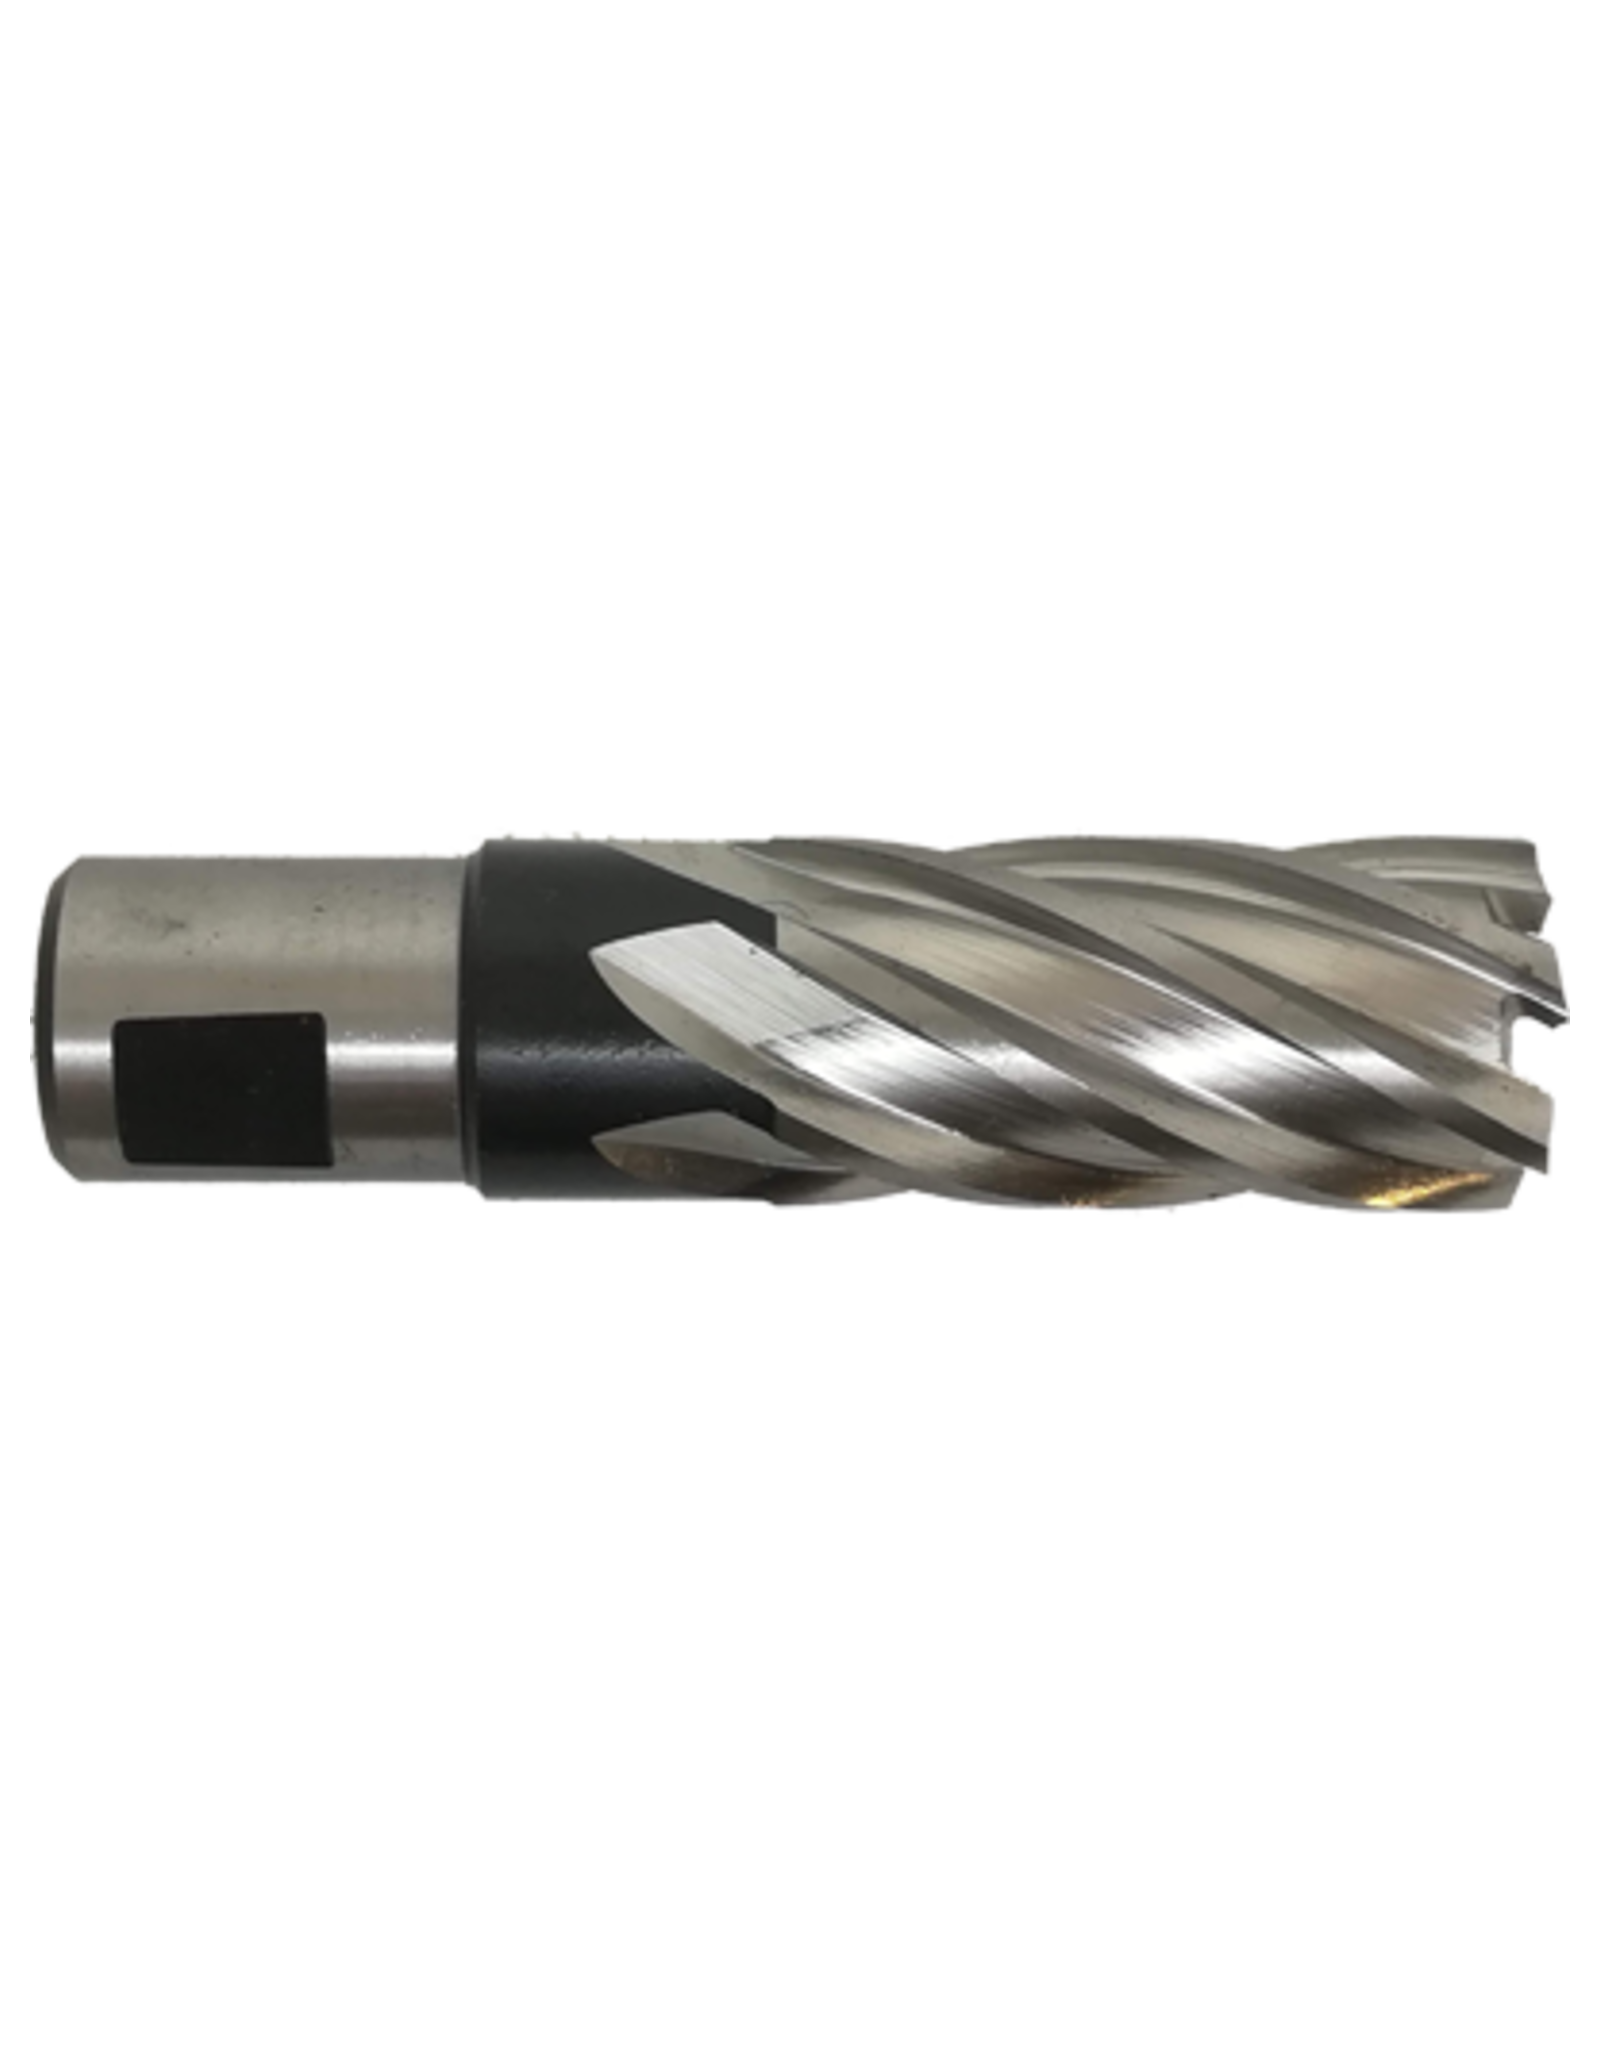 Evolution Power Tools Steel Line EVOLUTION CORE CUTTER LONG - 24 MM